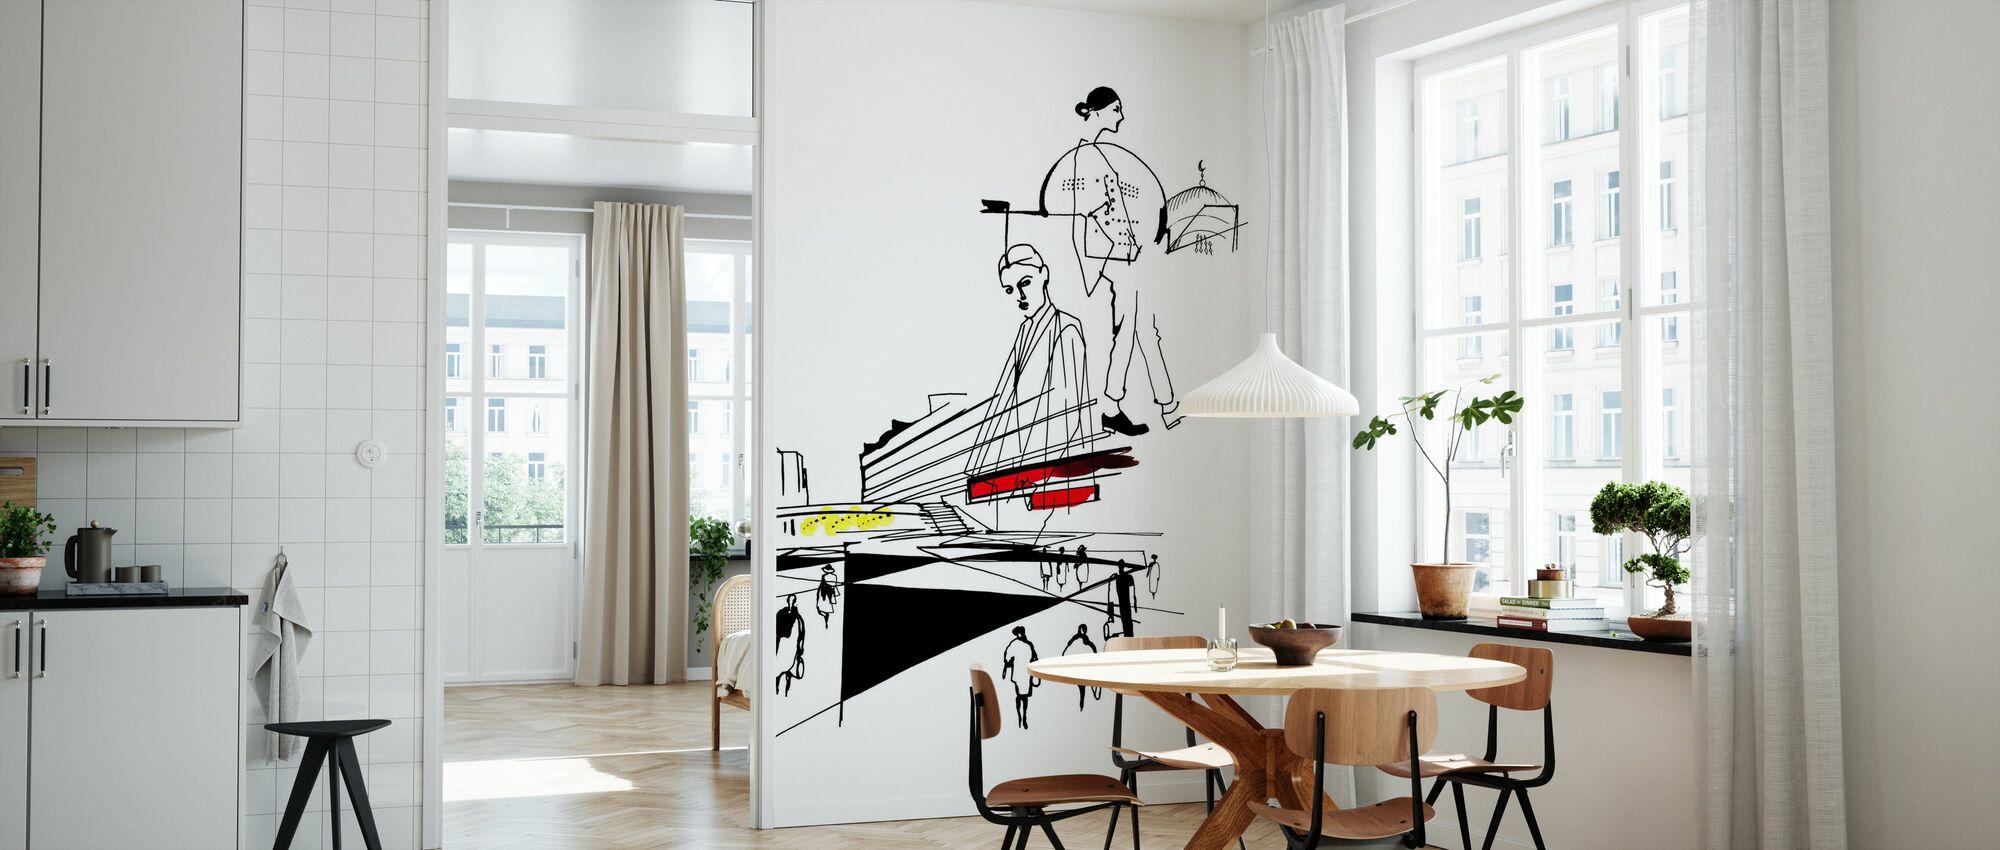 Stockholm - Sergels Torg - Wallpaper - Kitchen